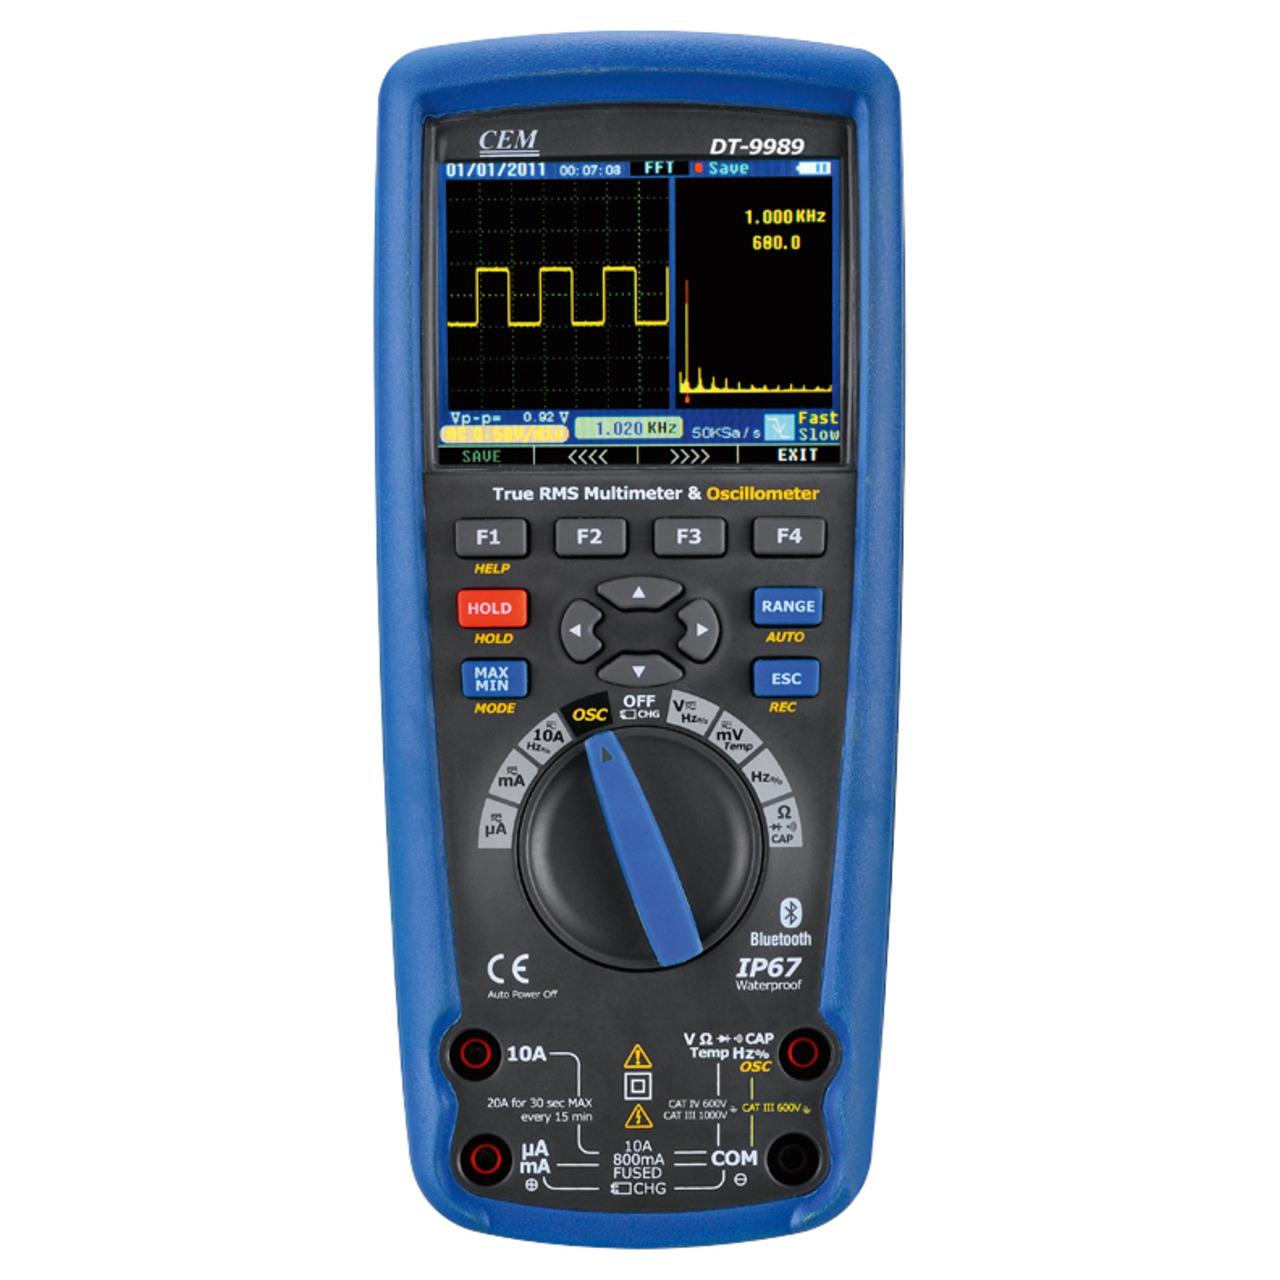 CEM Digital Multimeter DT-9989 mit True RMS + Oszilloskop